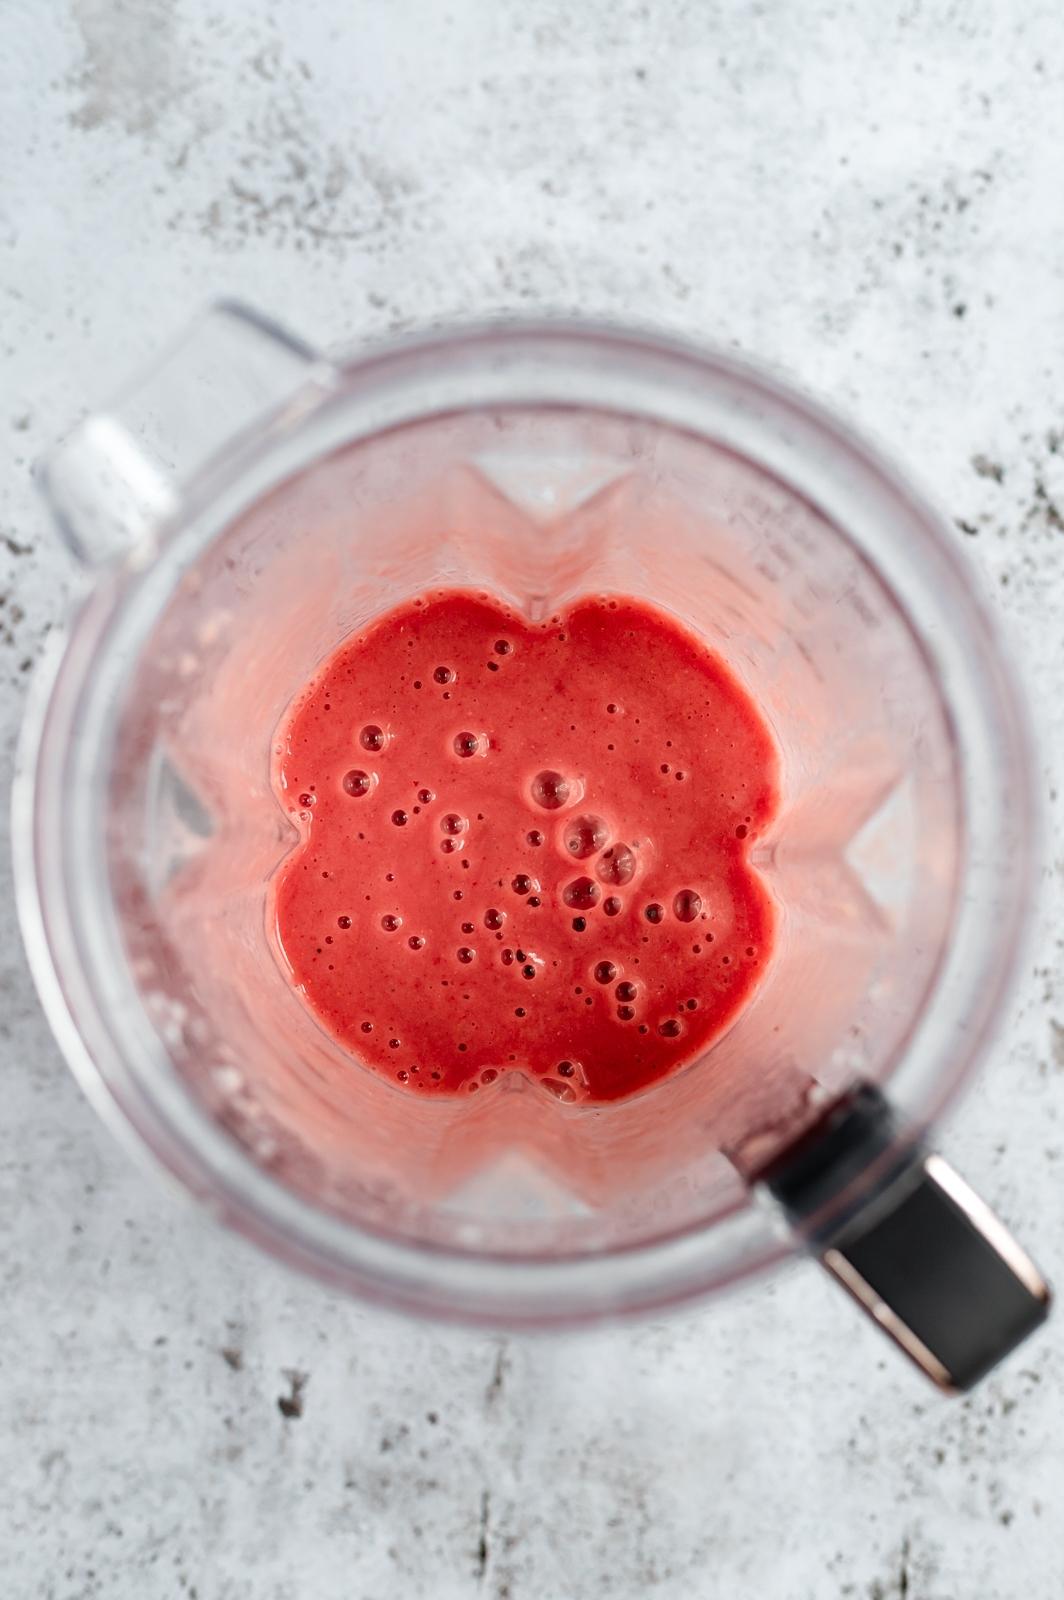 orange strawberry banana smoothie in a blender